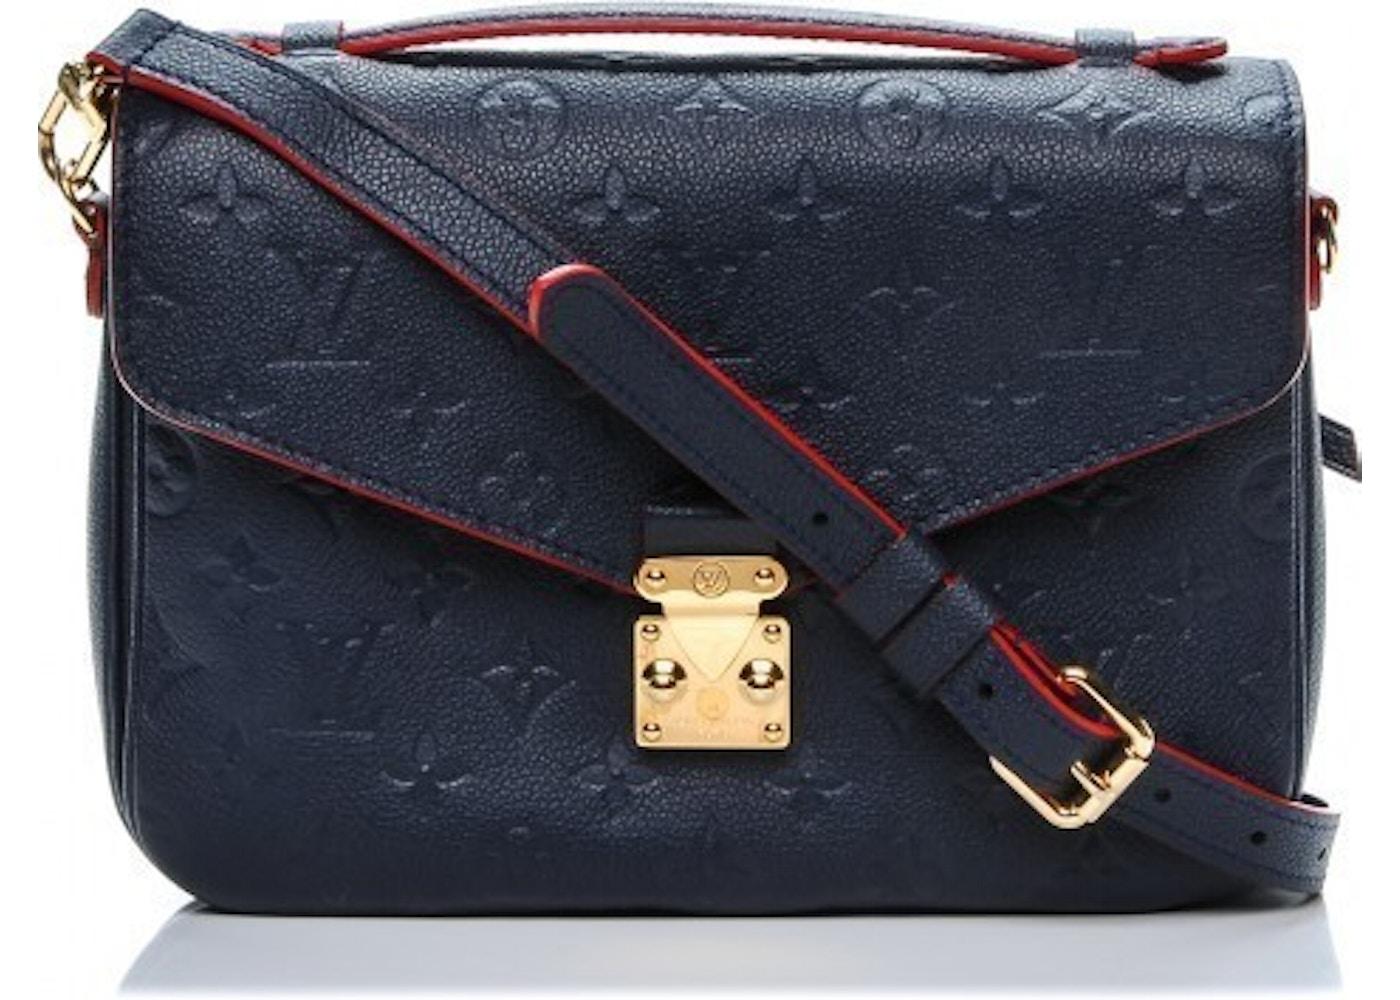 Louis Vuitton Pochette Metis Monogram Empreinte Marine Rouge. Monogram  Empreinte Marine Rouge 373615753d6a0